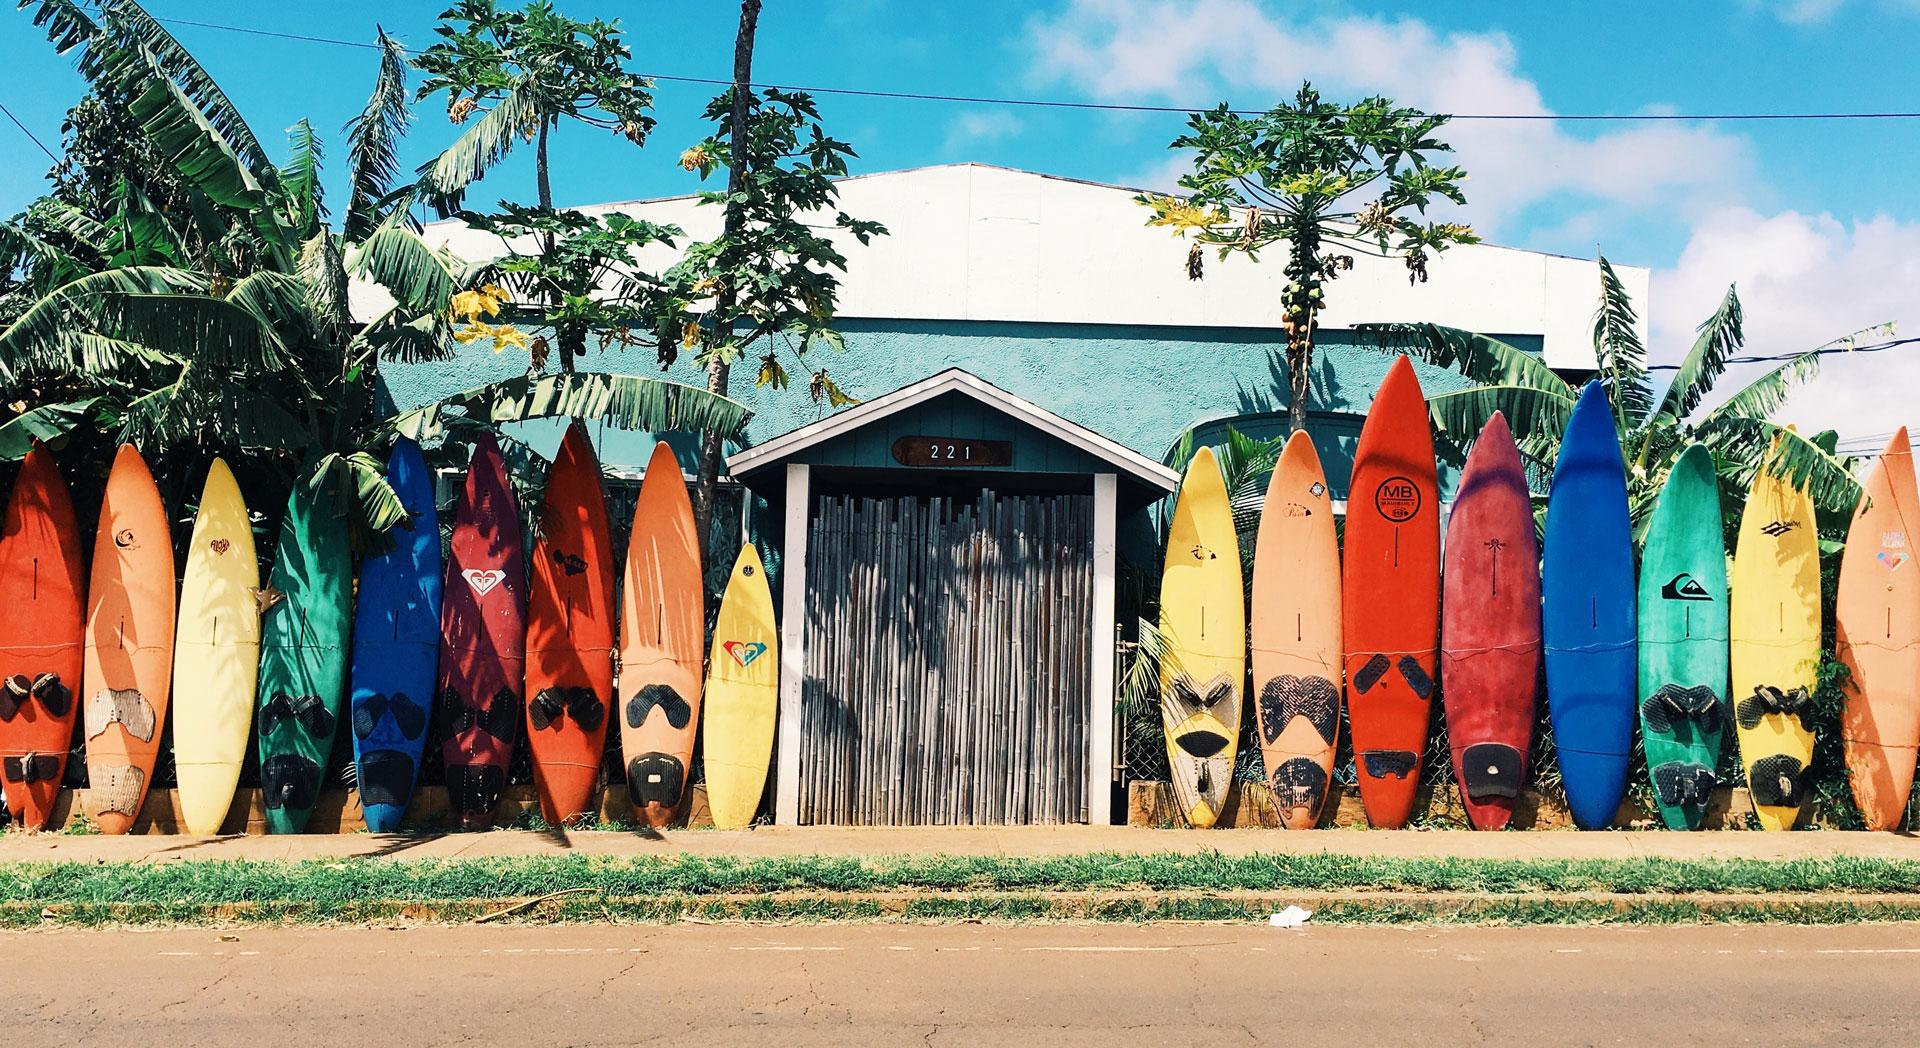 Familie Slotemaker op kitesurfreis in het mooie Brazilië.